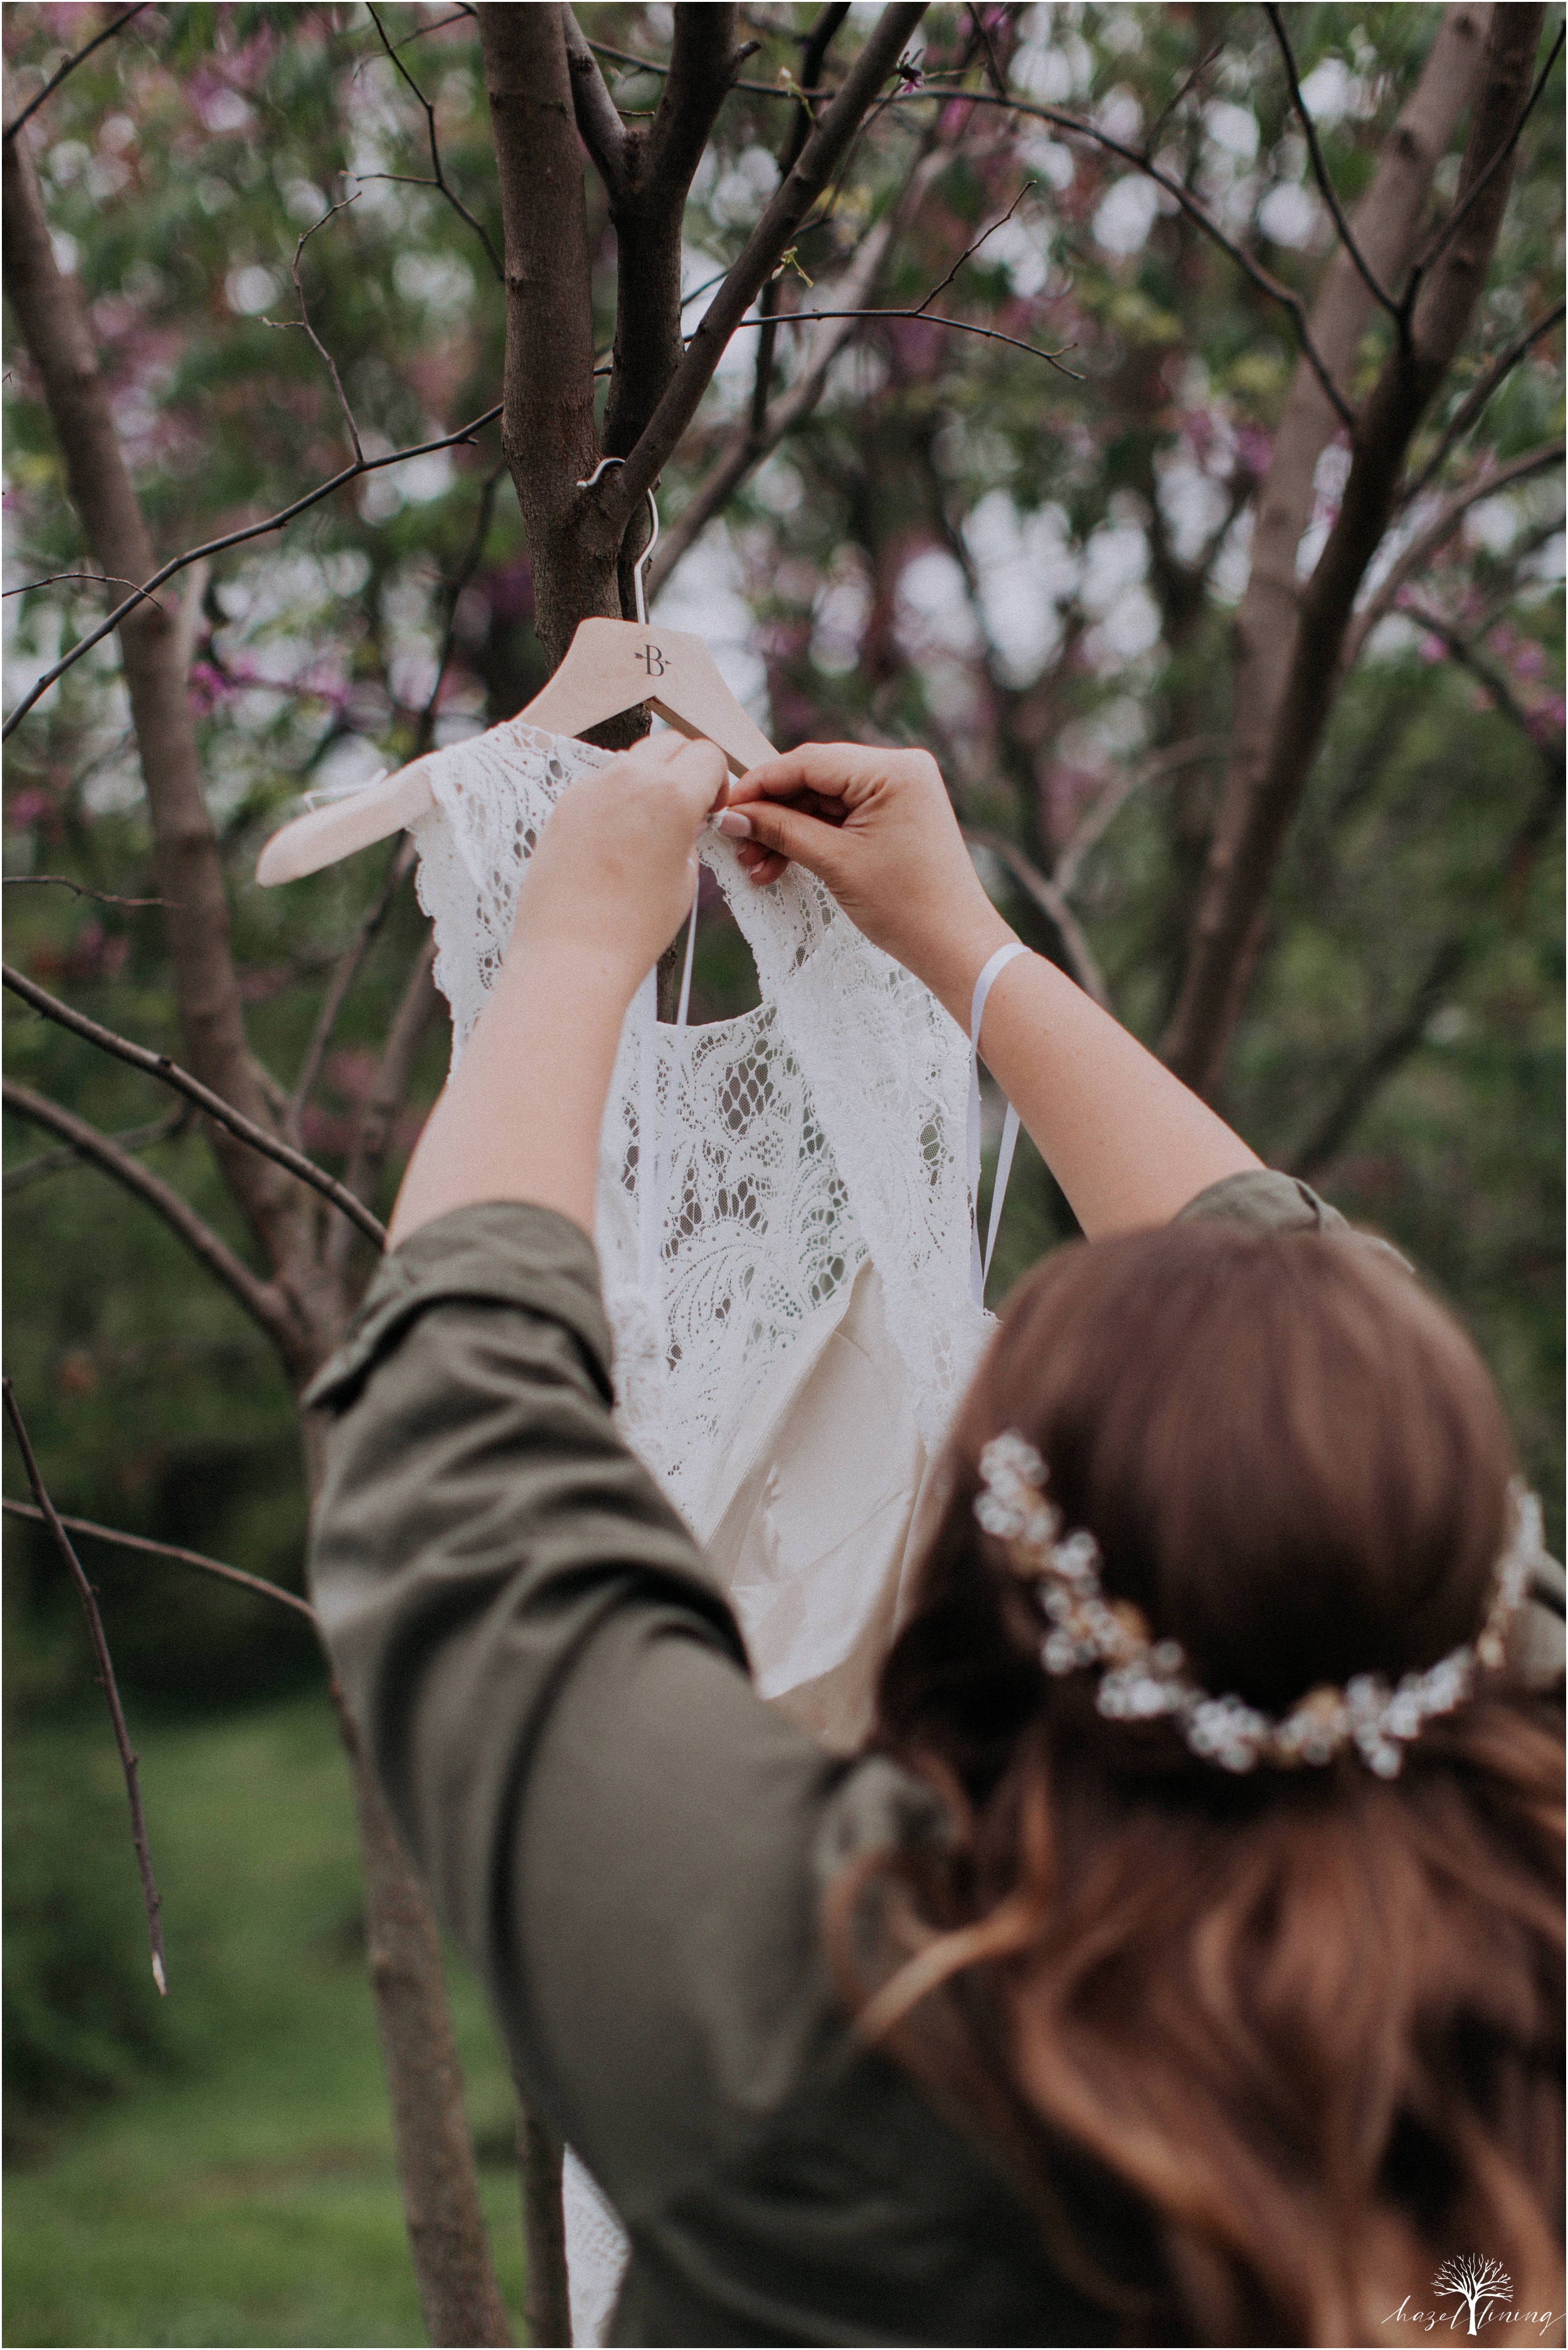 hazel-lining-travel-wedding-elopement-photography-abby-skyler-hunt-the-willis-house-york-pennsylvania-outdoor-estate-wedding_0010.jpg